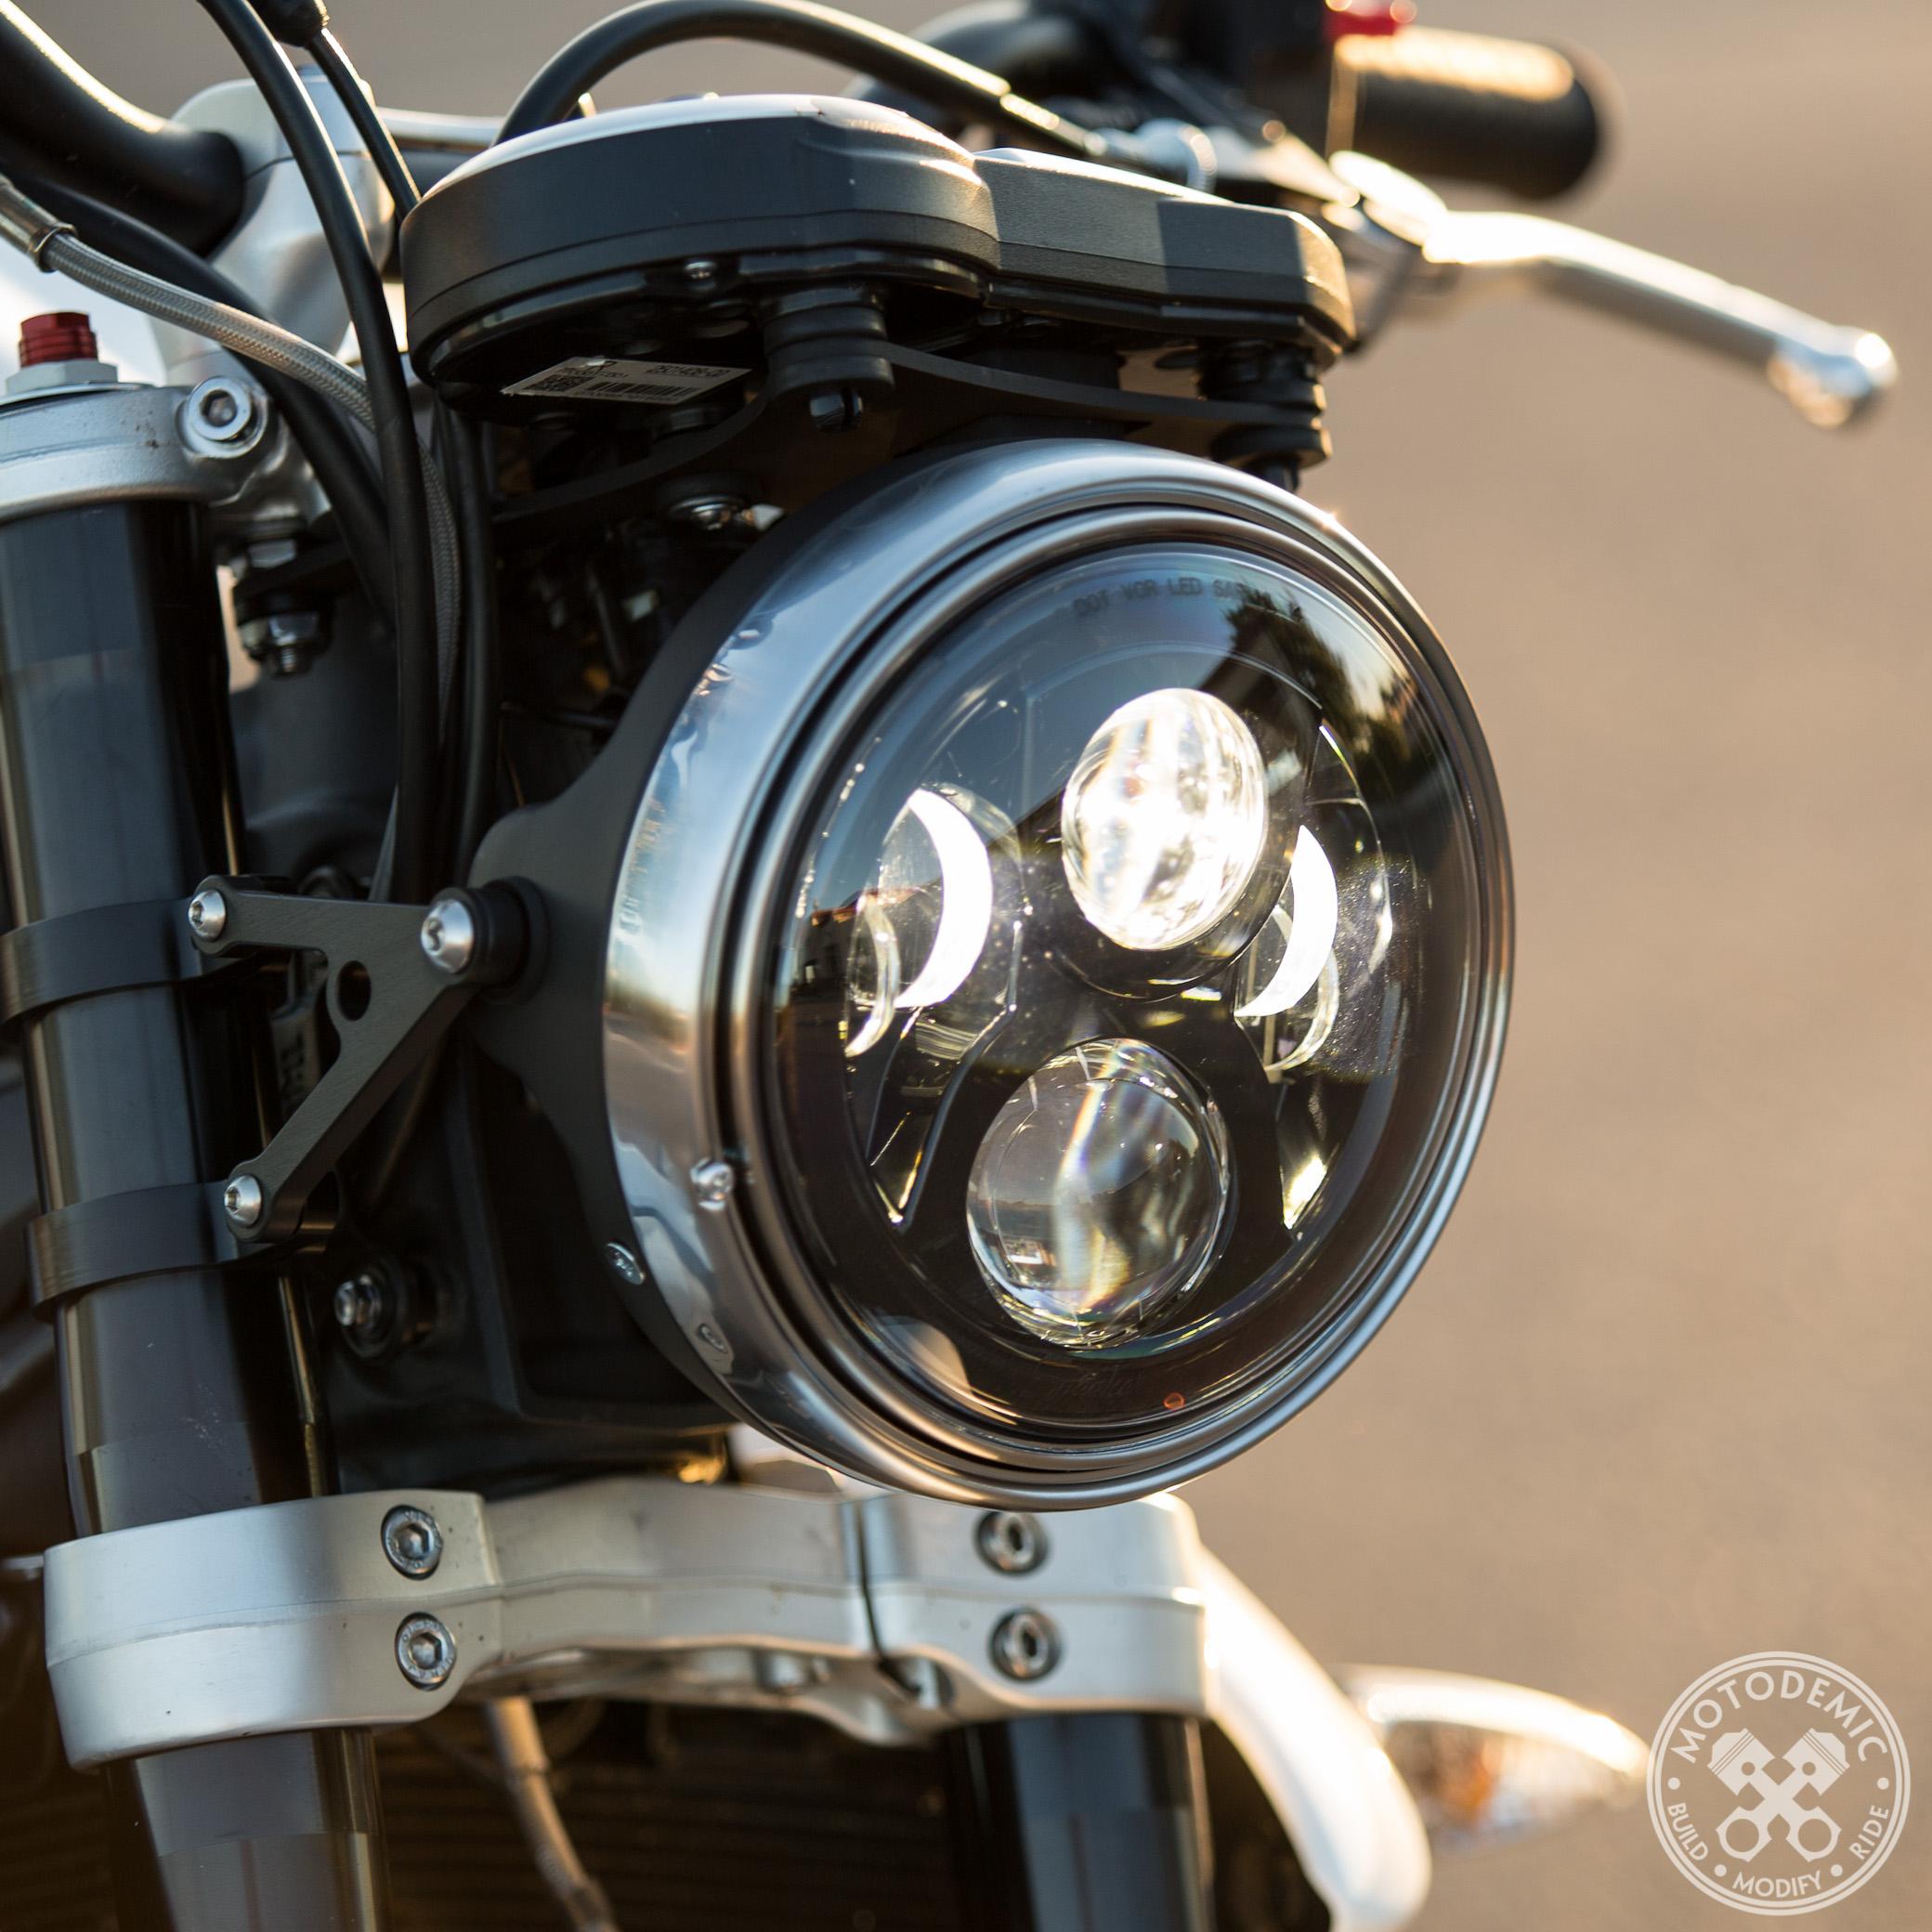 7 Inch LED Headlight Evo 2 • MOTODEMIC for Motorcycle Headlight Design  104xkb